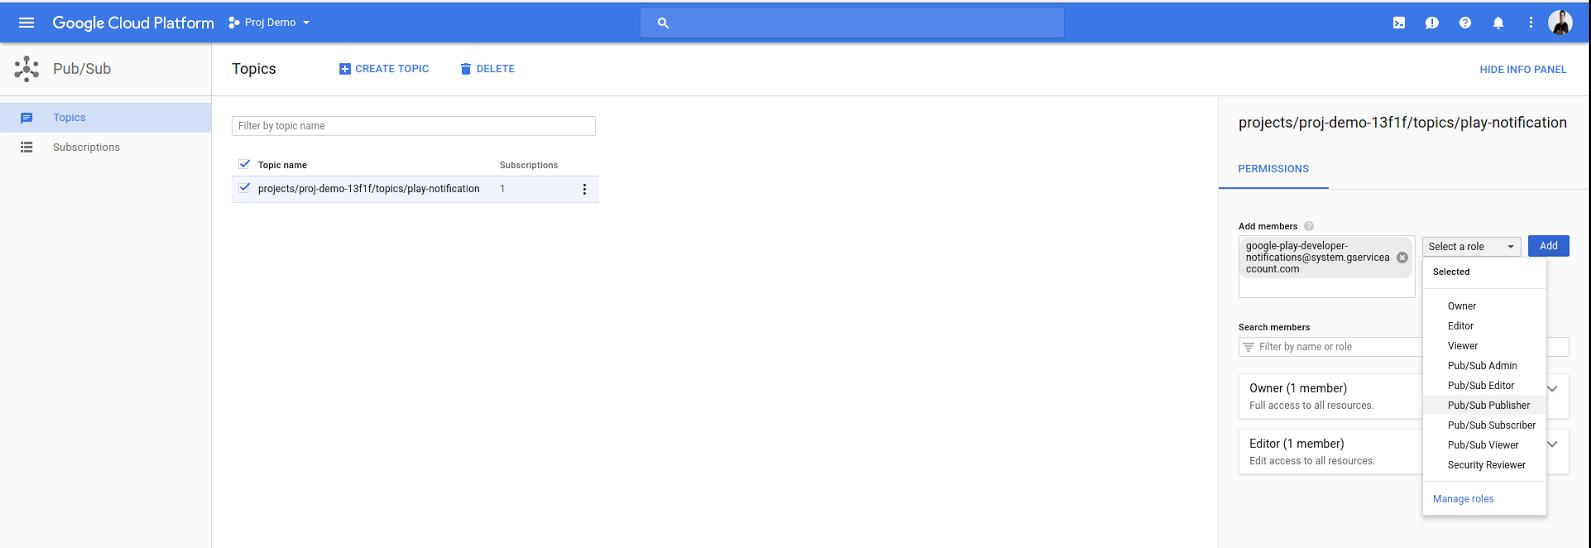 adding google play service account as pub/sub publisher